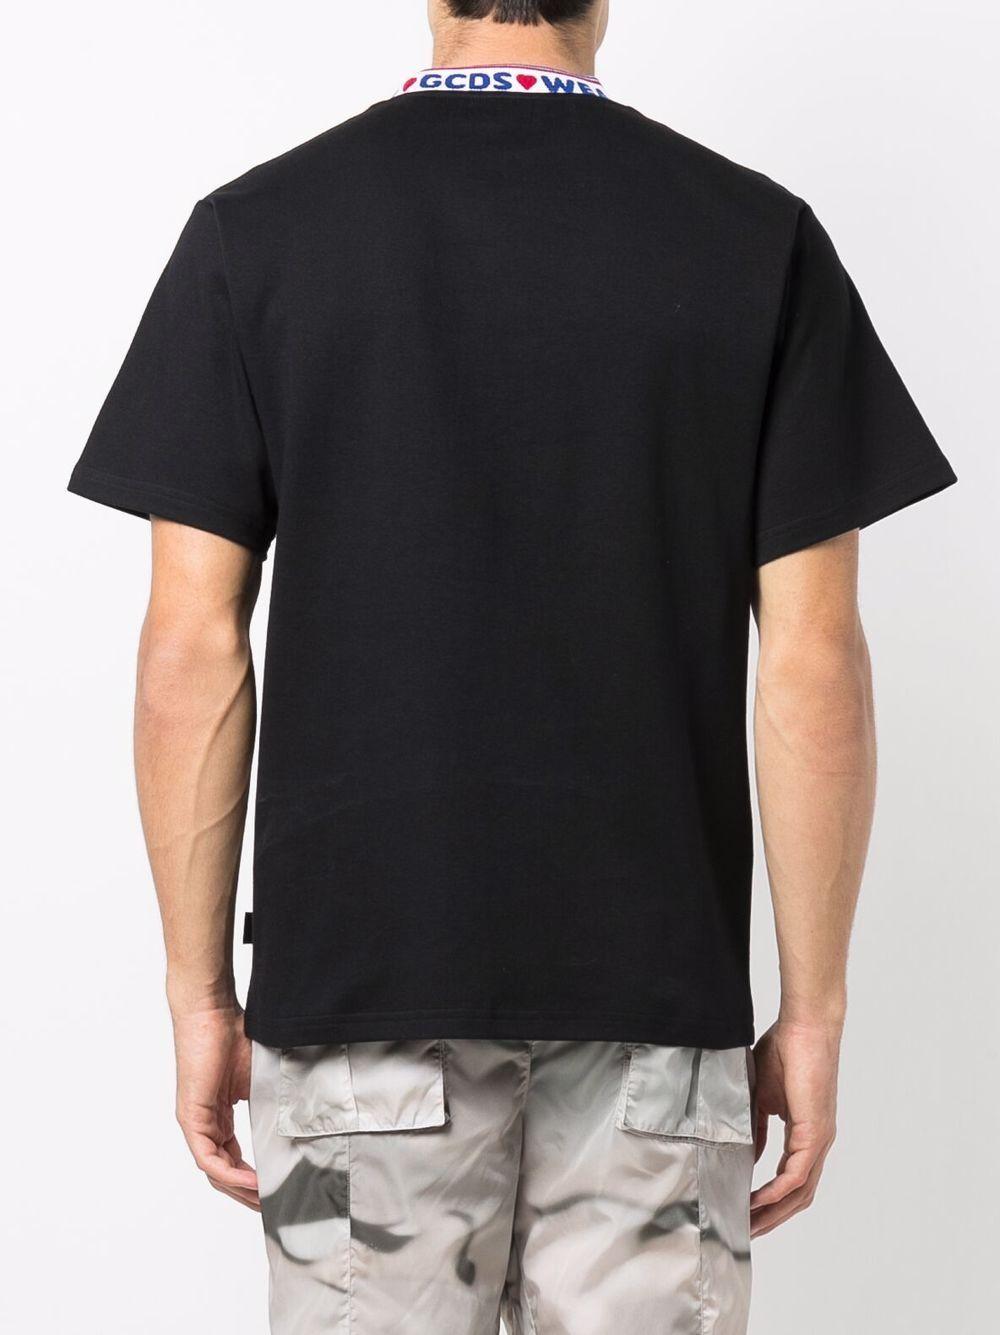 collar t-shirt man black in cotton GCDS   T-shirts   CC94M02150402